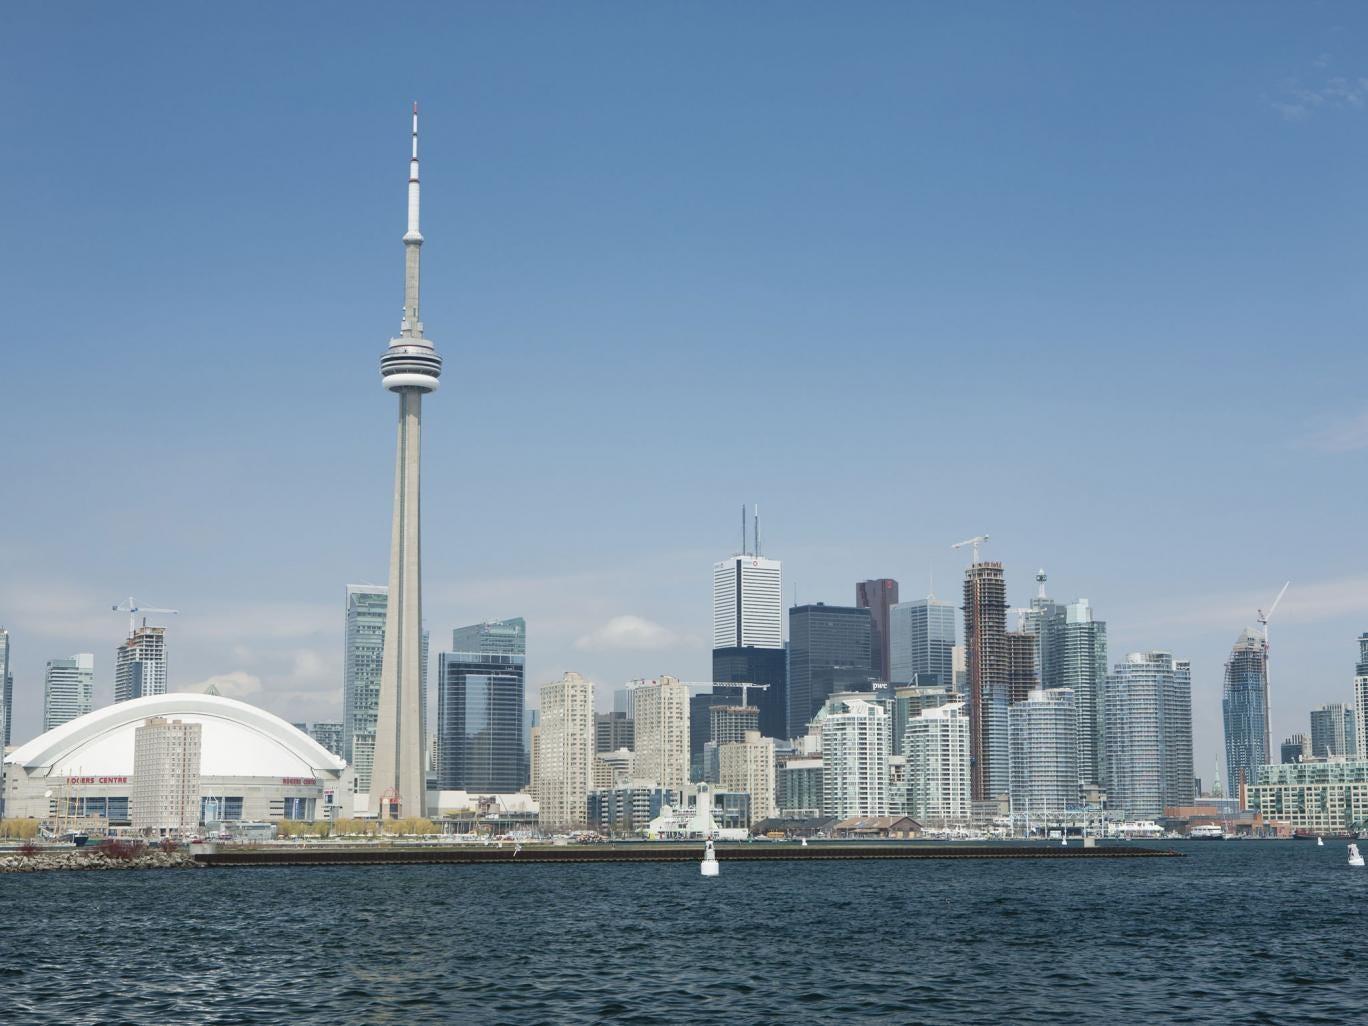 Toronto Skyline From Lake Ontario With Blue Sky And Clouds Toronto, Ontario, Canada 2013